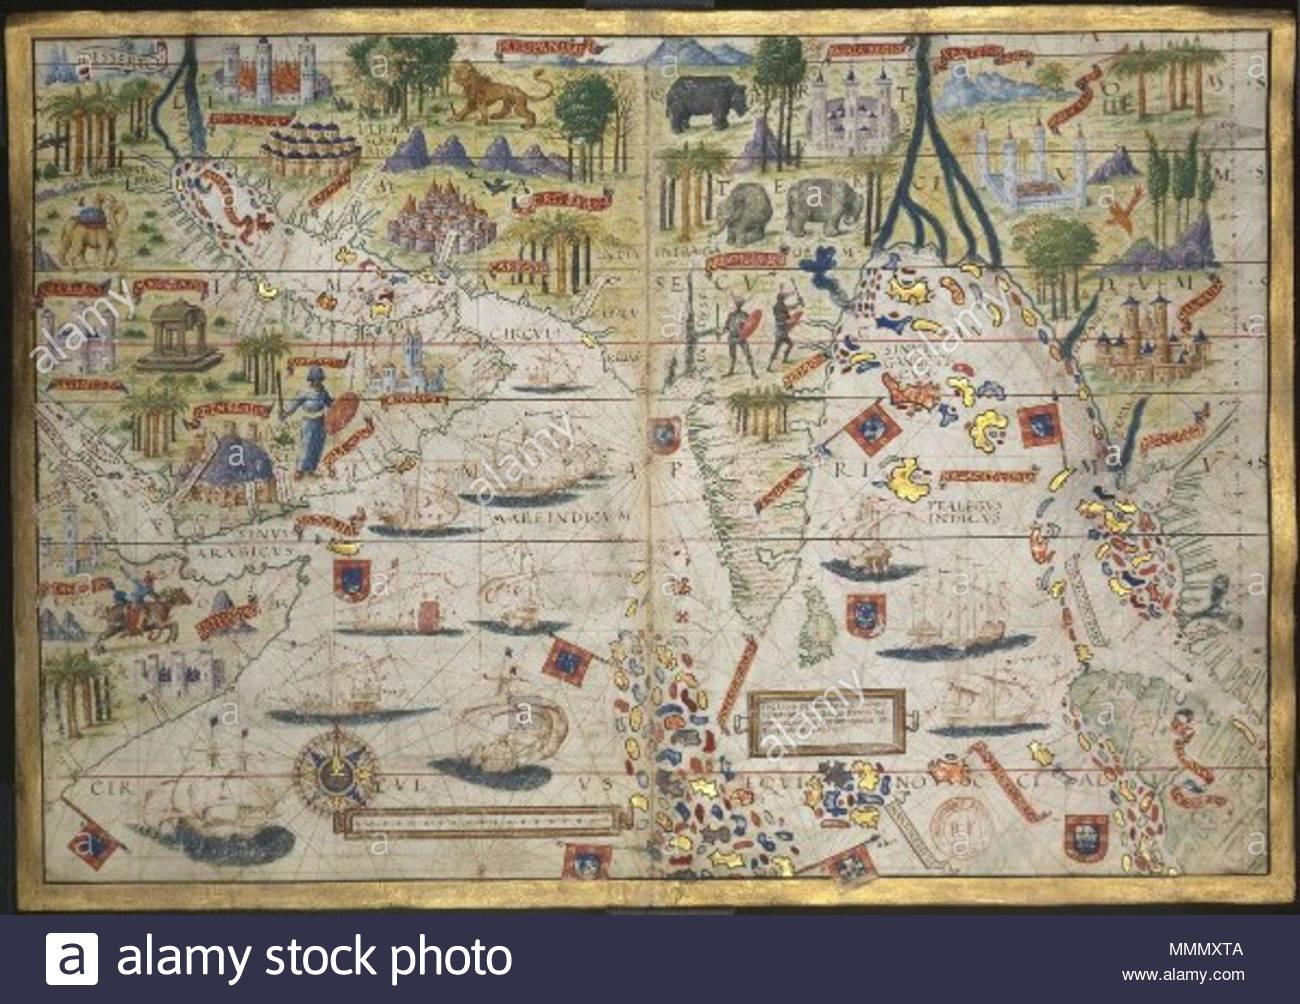 . English: Map of the Atlas Miller showing the Indian Ocean. Español: Mapa del Atlas Miller que muestra el océano Índico.  . circa 1519. Unsigned. Attributed to Lopo Homem, Jorge Reinel, Pedro Reinel and Antonio de Holanda. 62 AtlasMiller BNF OceanoIndico - Stock Image